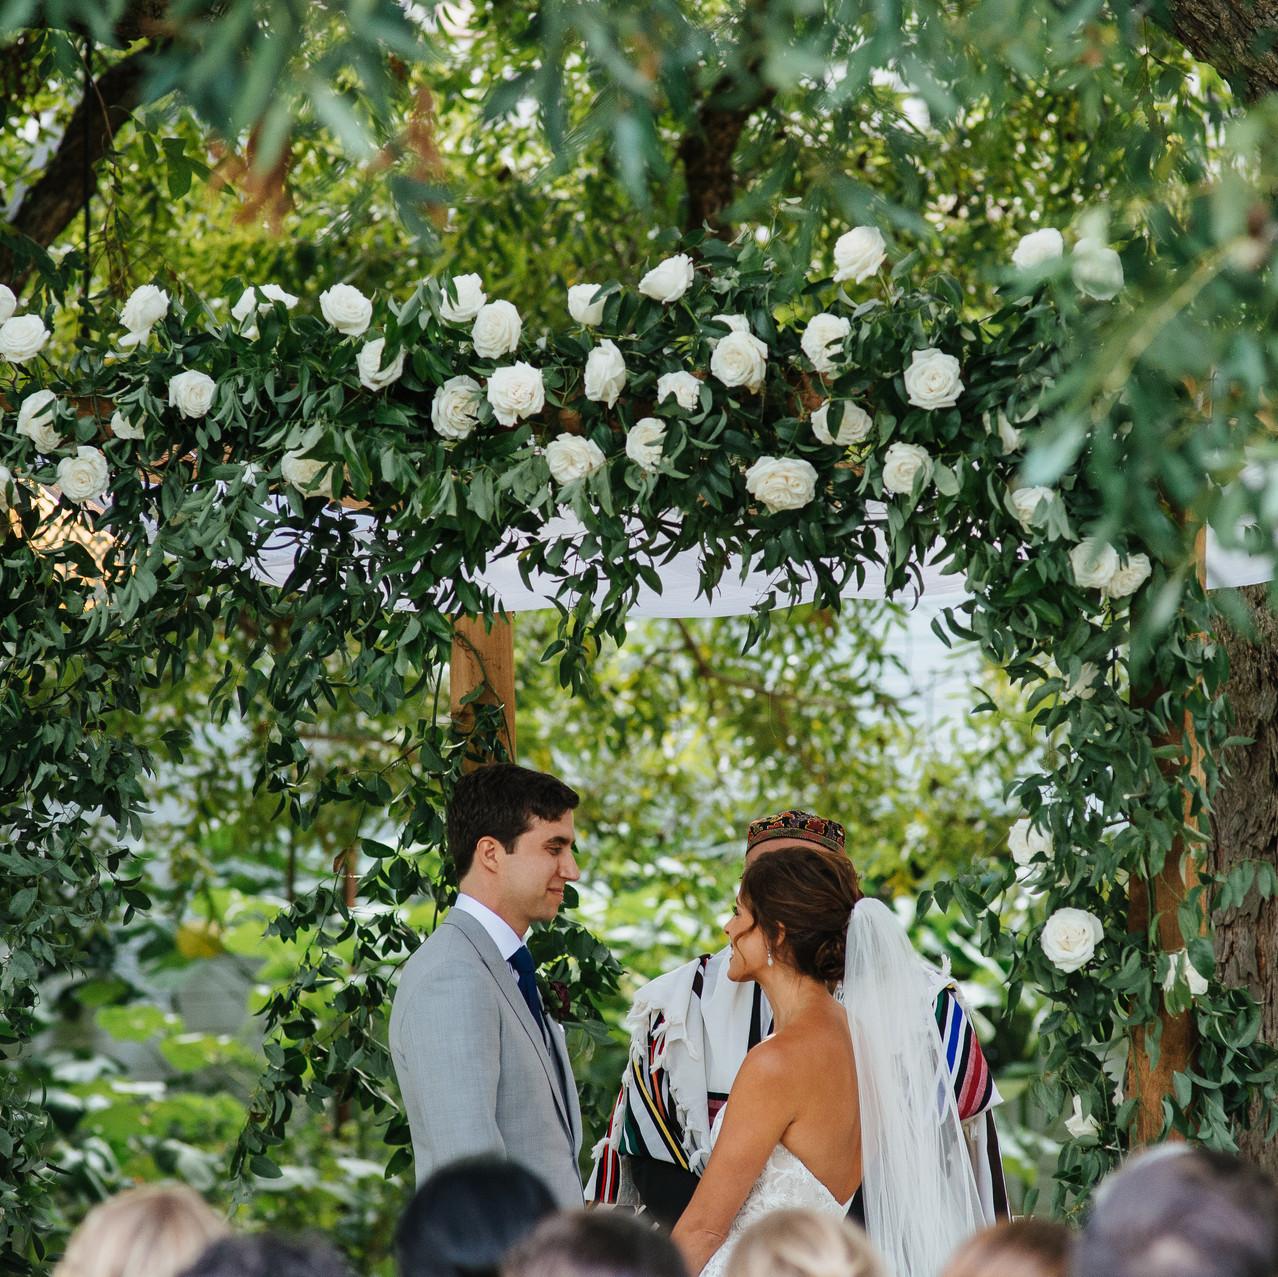 40-Ozer-Gati Wedding-Barr Mansion Jewish